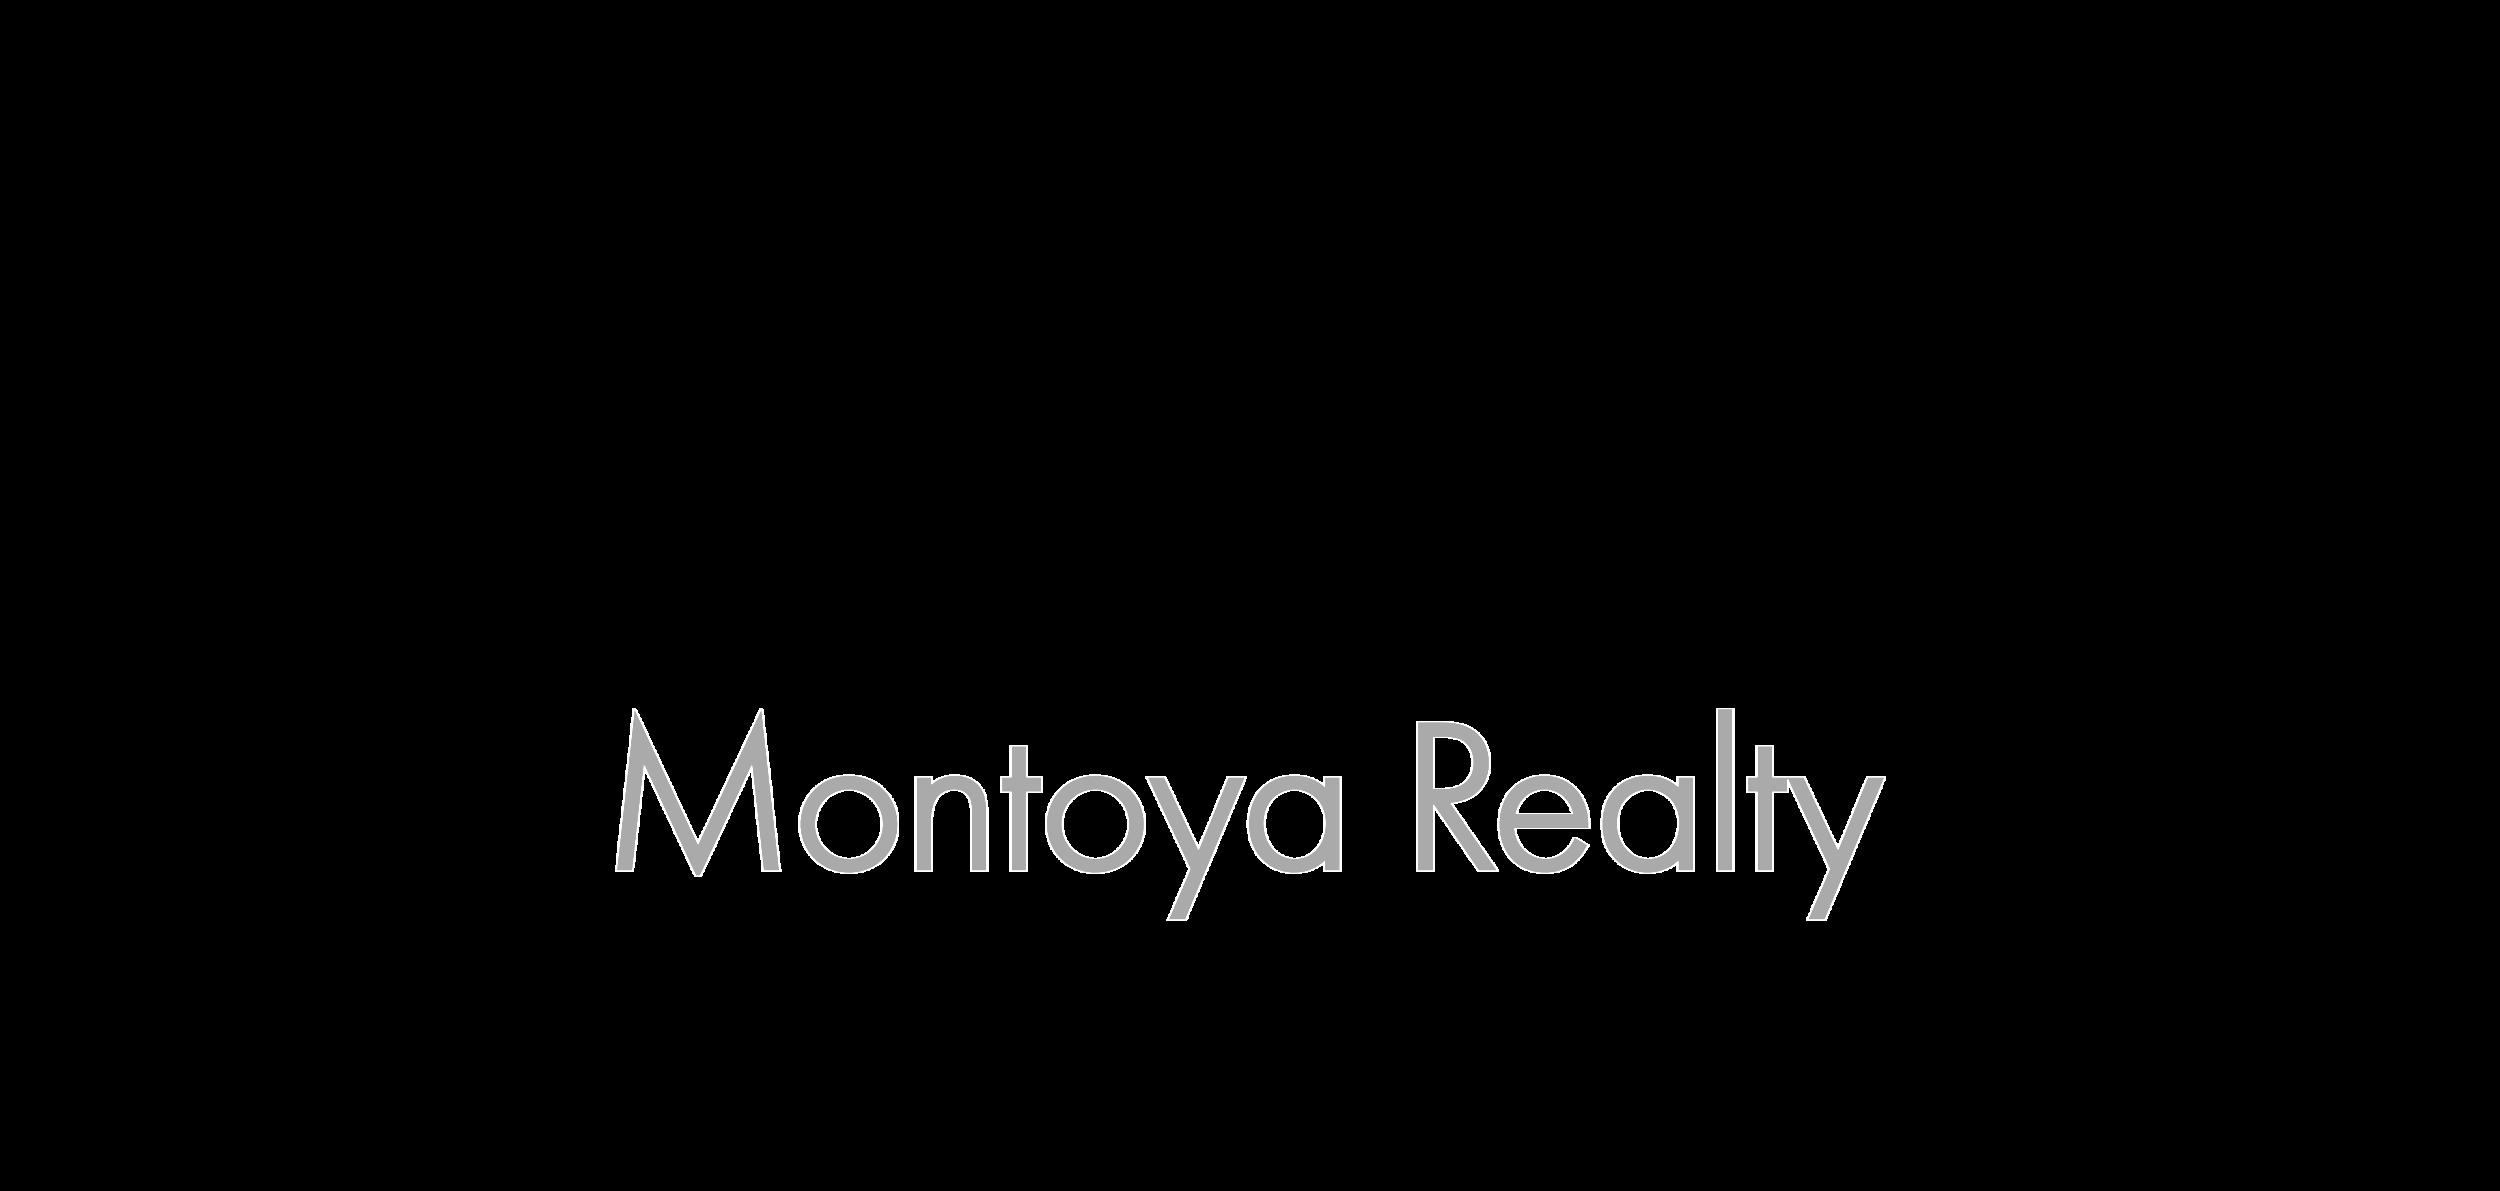 Montoya Realty